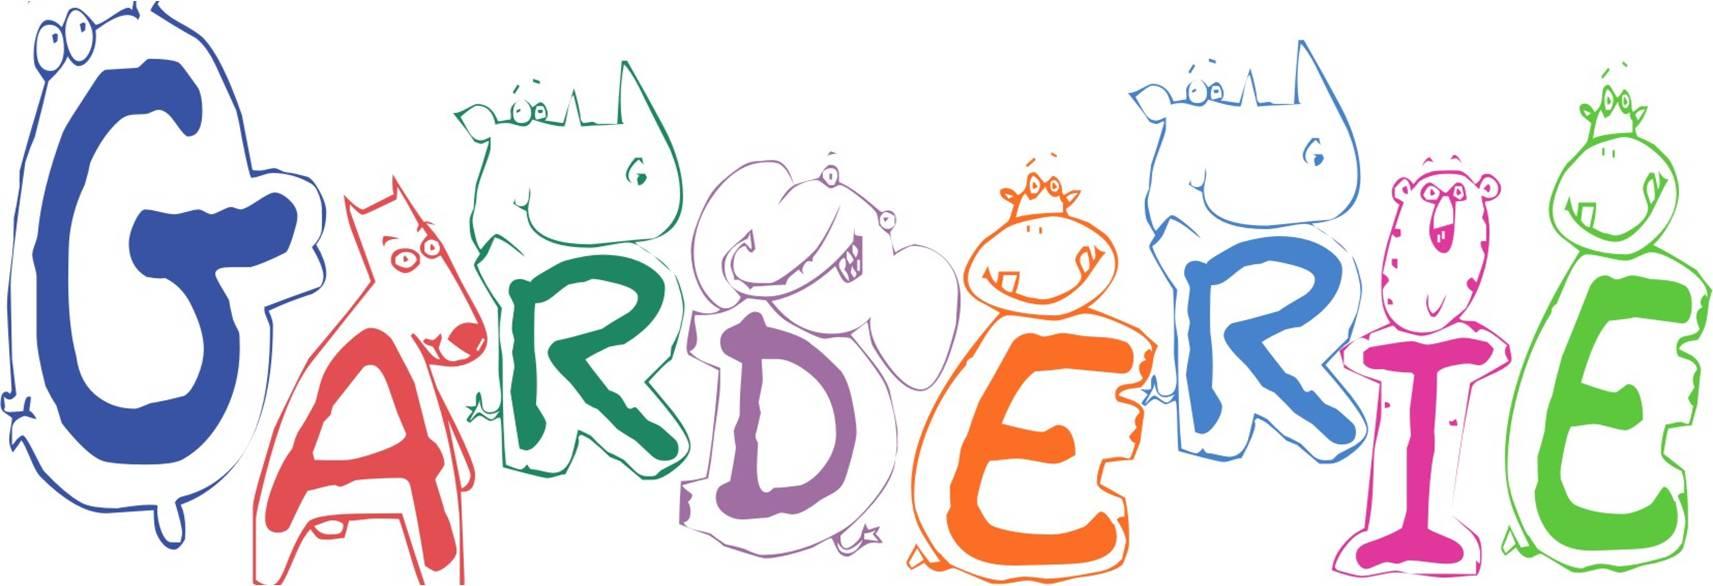 logo gratuit garderie